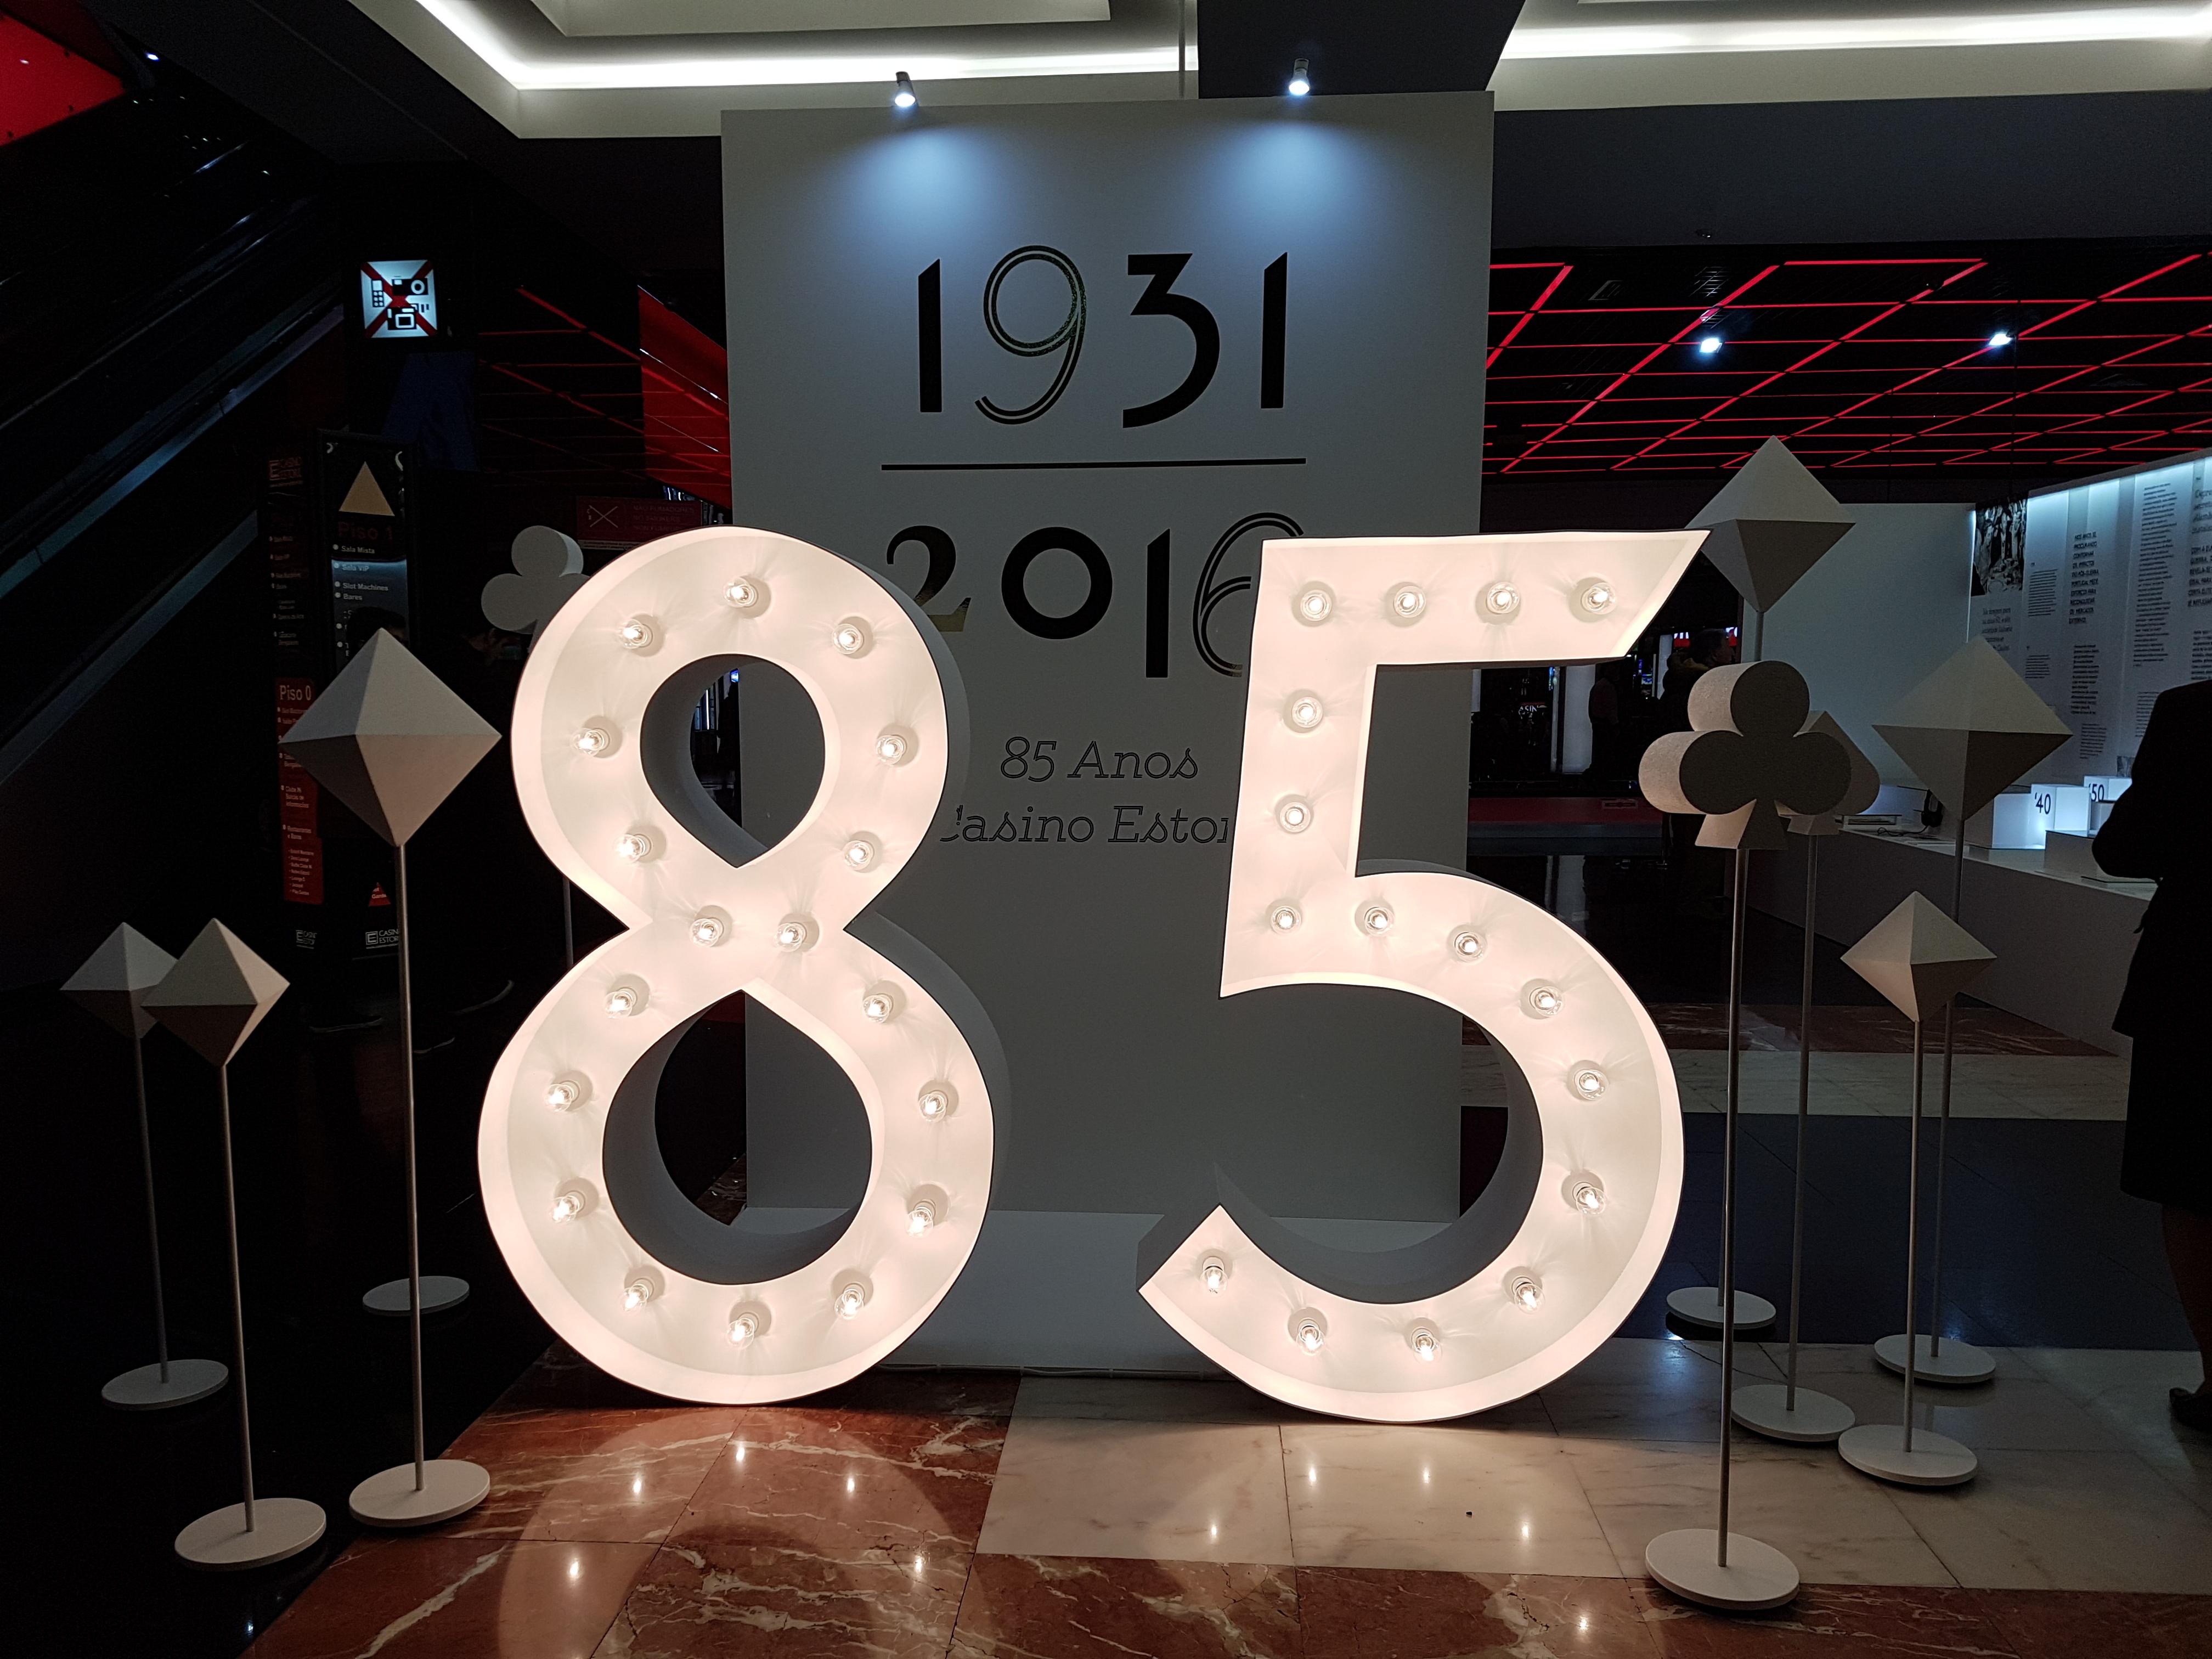 20161126_193716